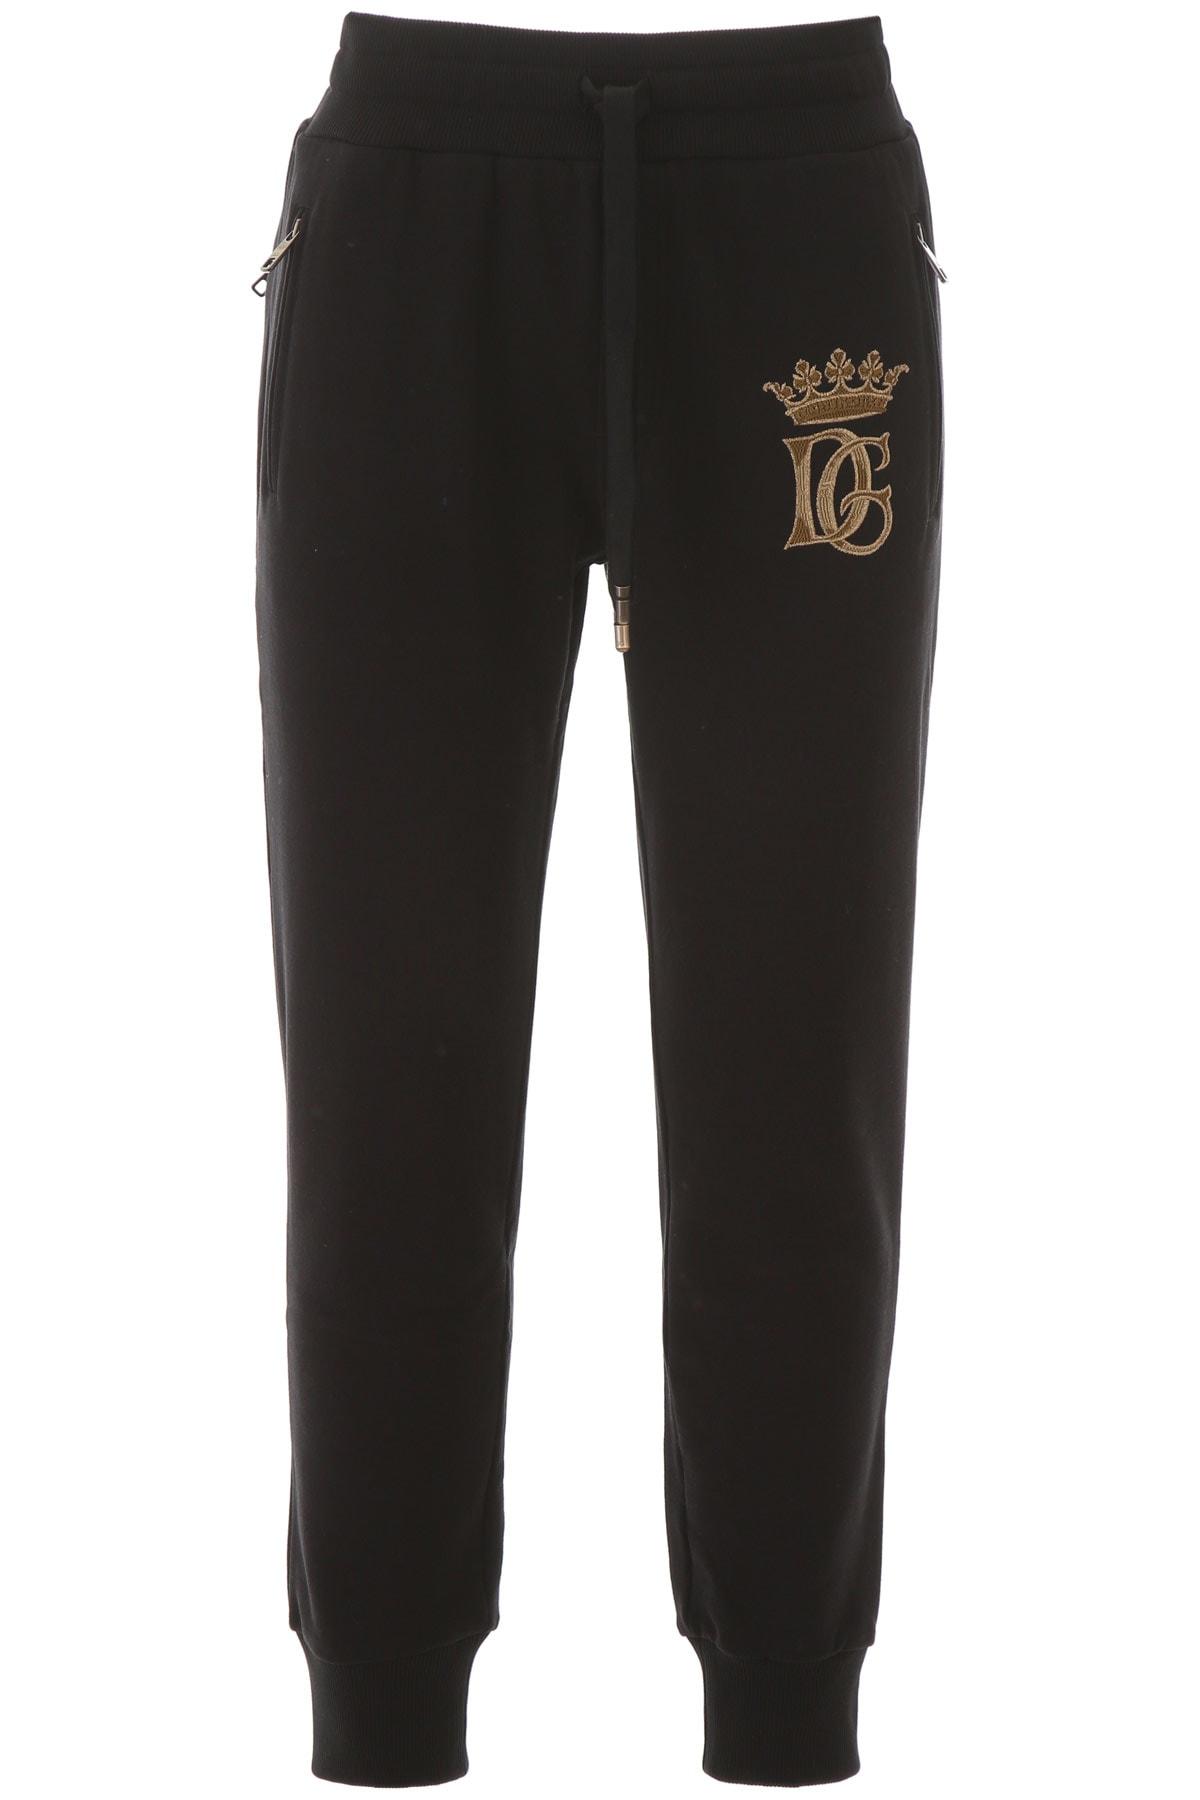 Dolce & Gabbana Sweatpants With Logo